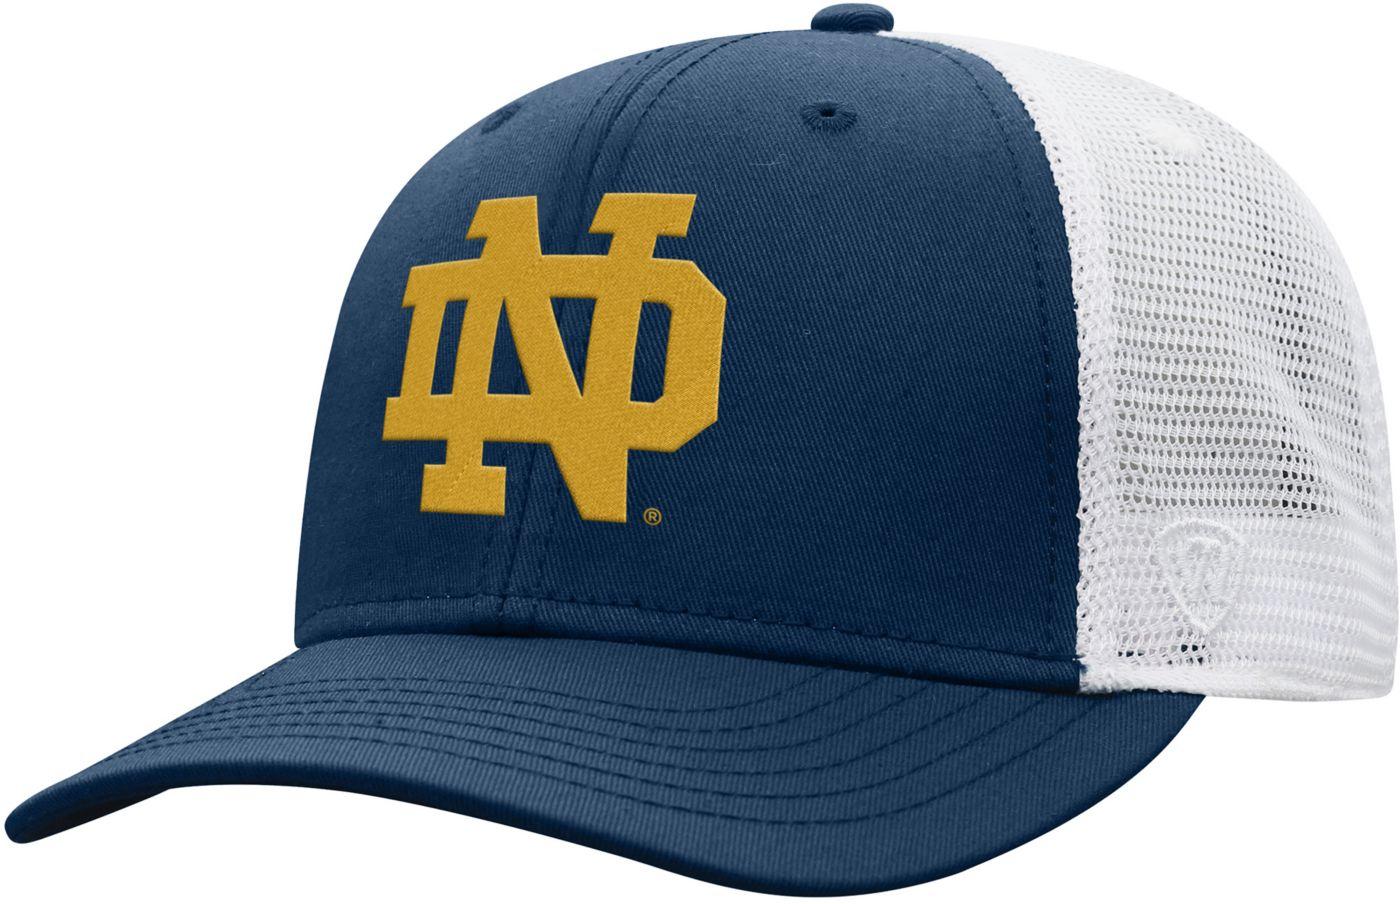 Top of the World Men's Notre Dame Fighting Irish Navy/White Trucker Adjustable Hat